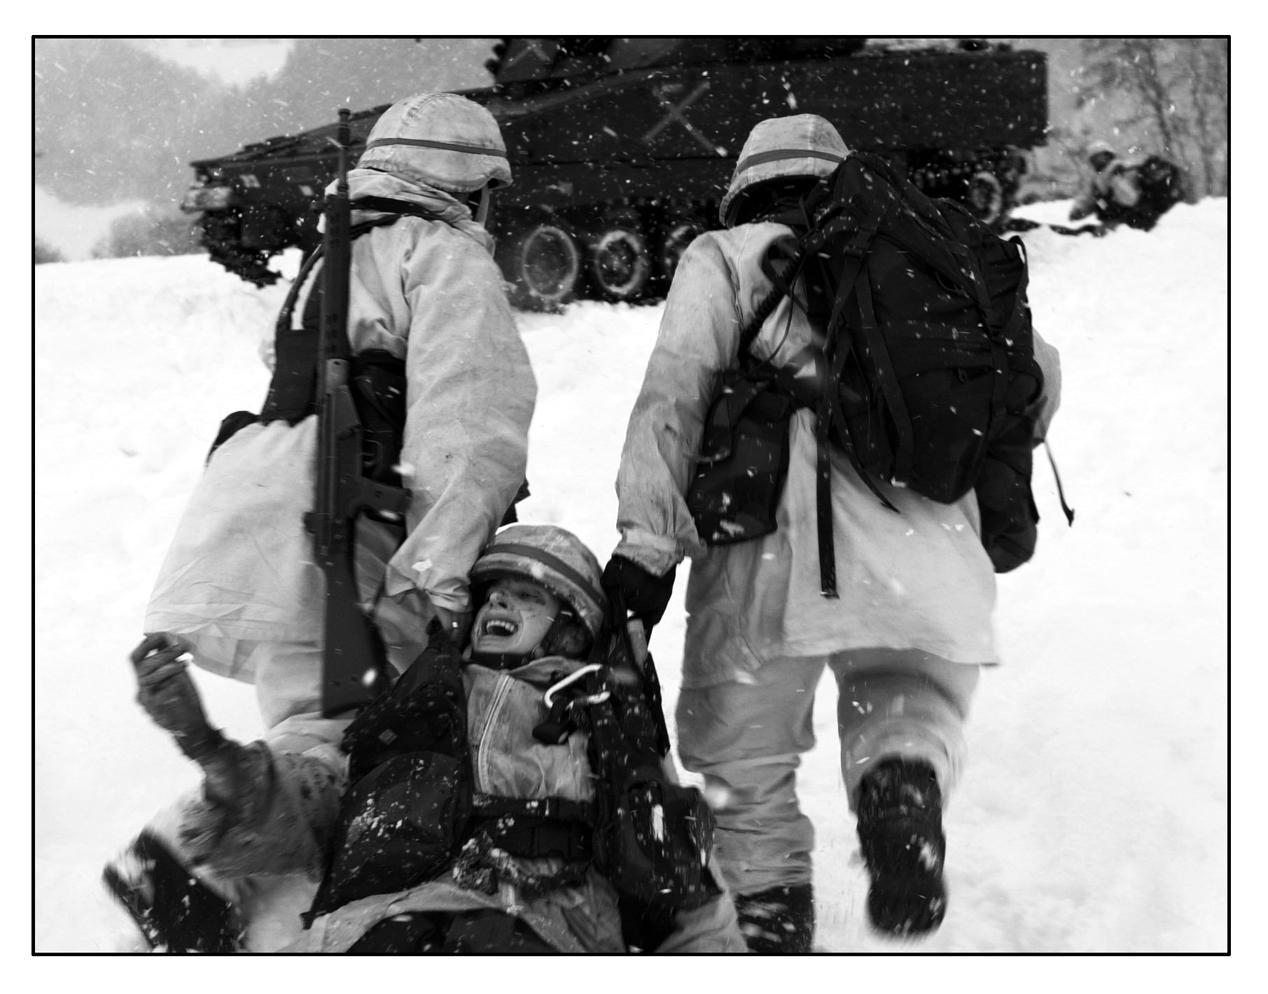 wounded still screaming by KjetilofNorway